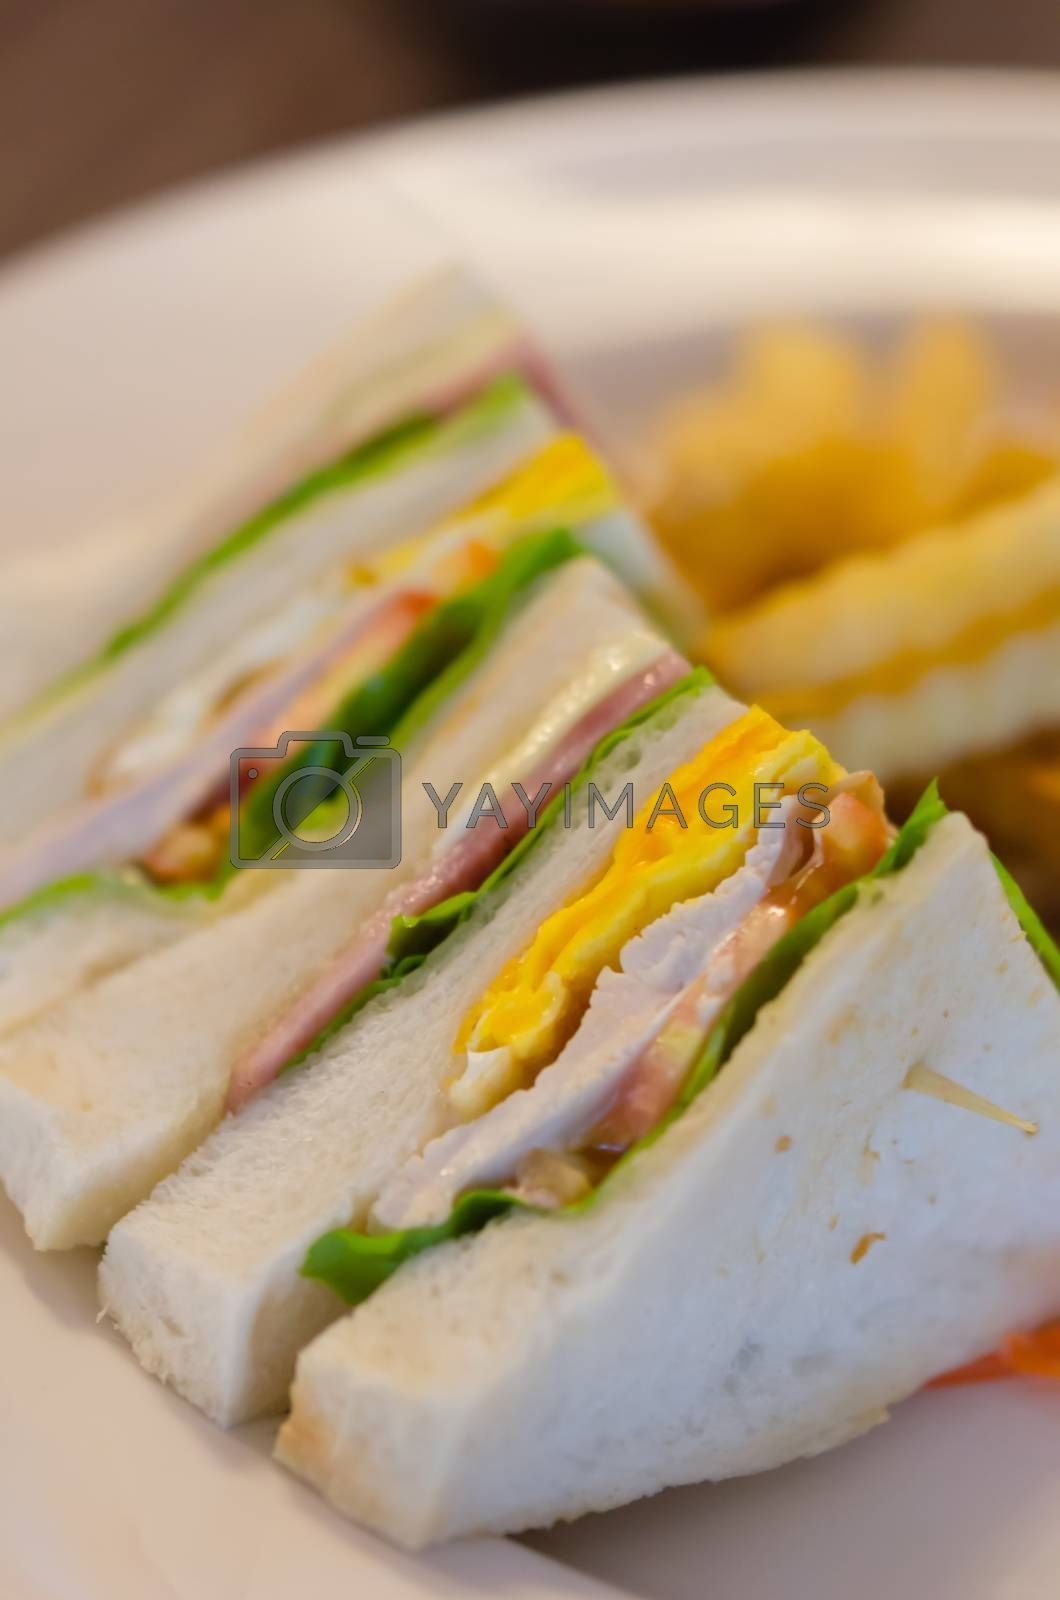 Royalty free image of club sandwich by rakratchada